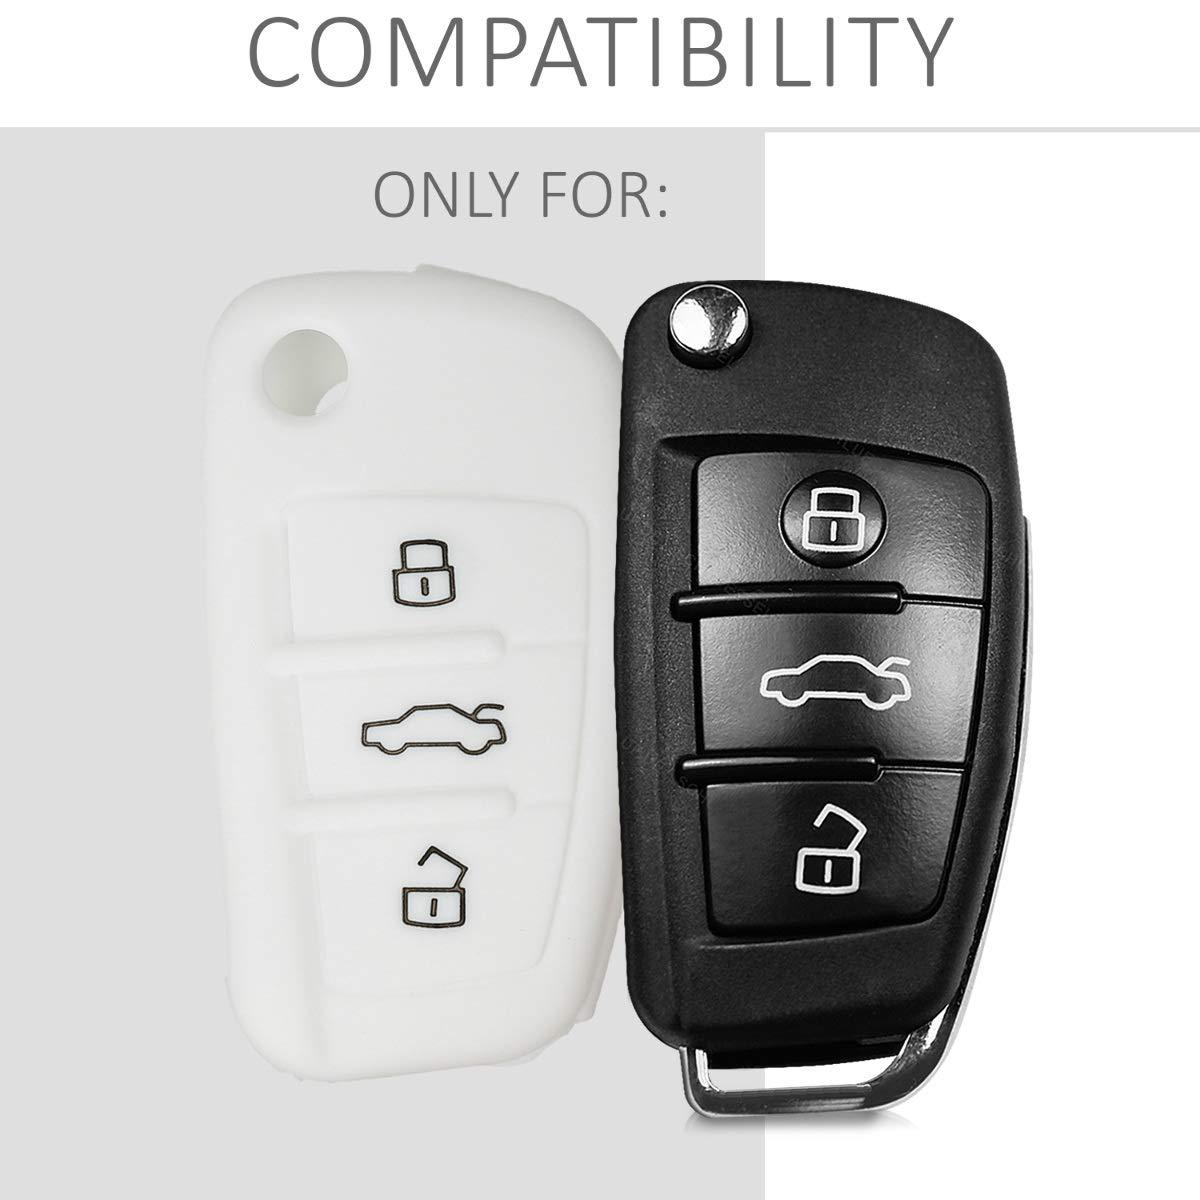 Carcasa Protectora Suave de Silicona Case de Mando de Auto con dise/ño Racing kwmobile Funda para Llave Plegable de 3 Botones para Coche Audi